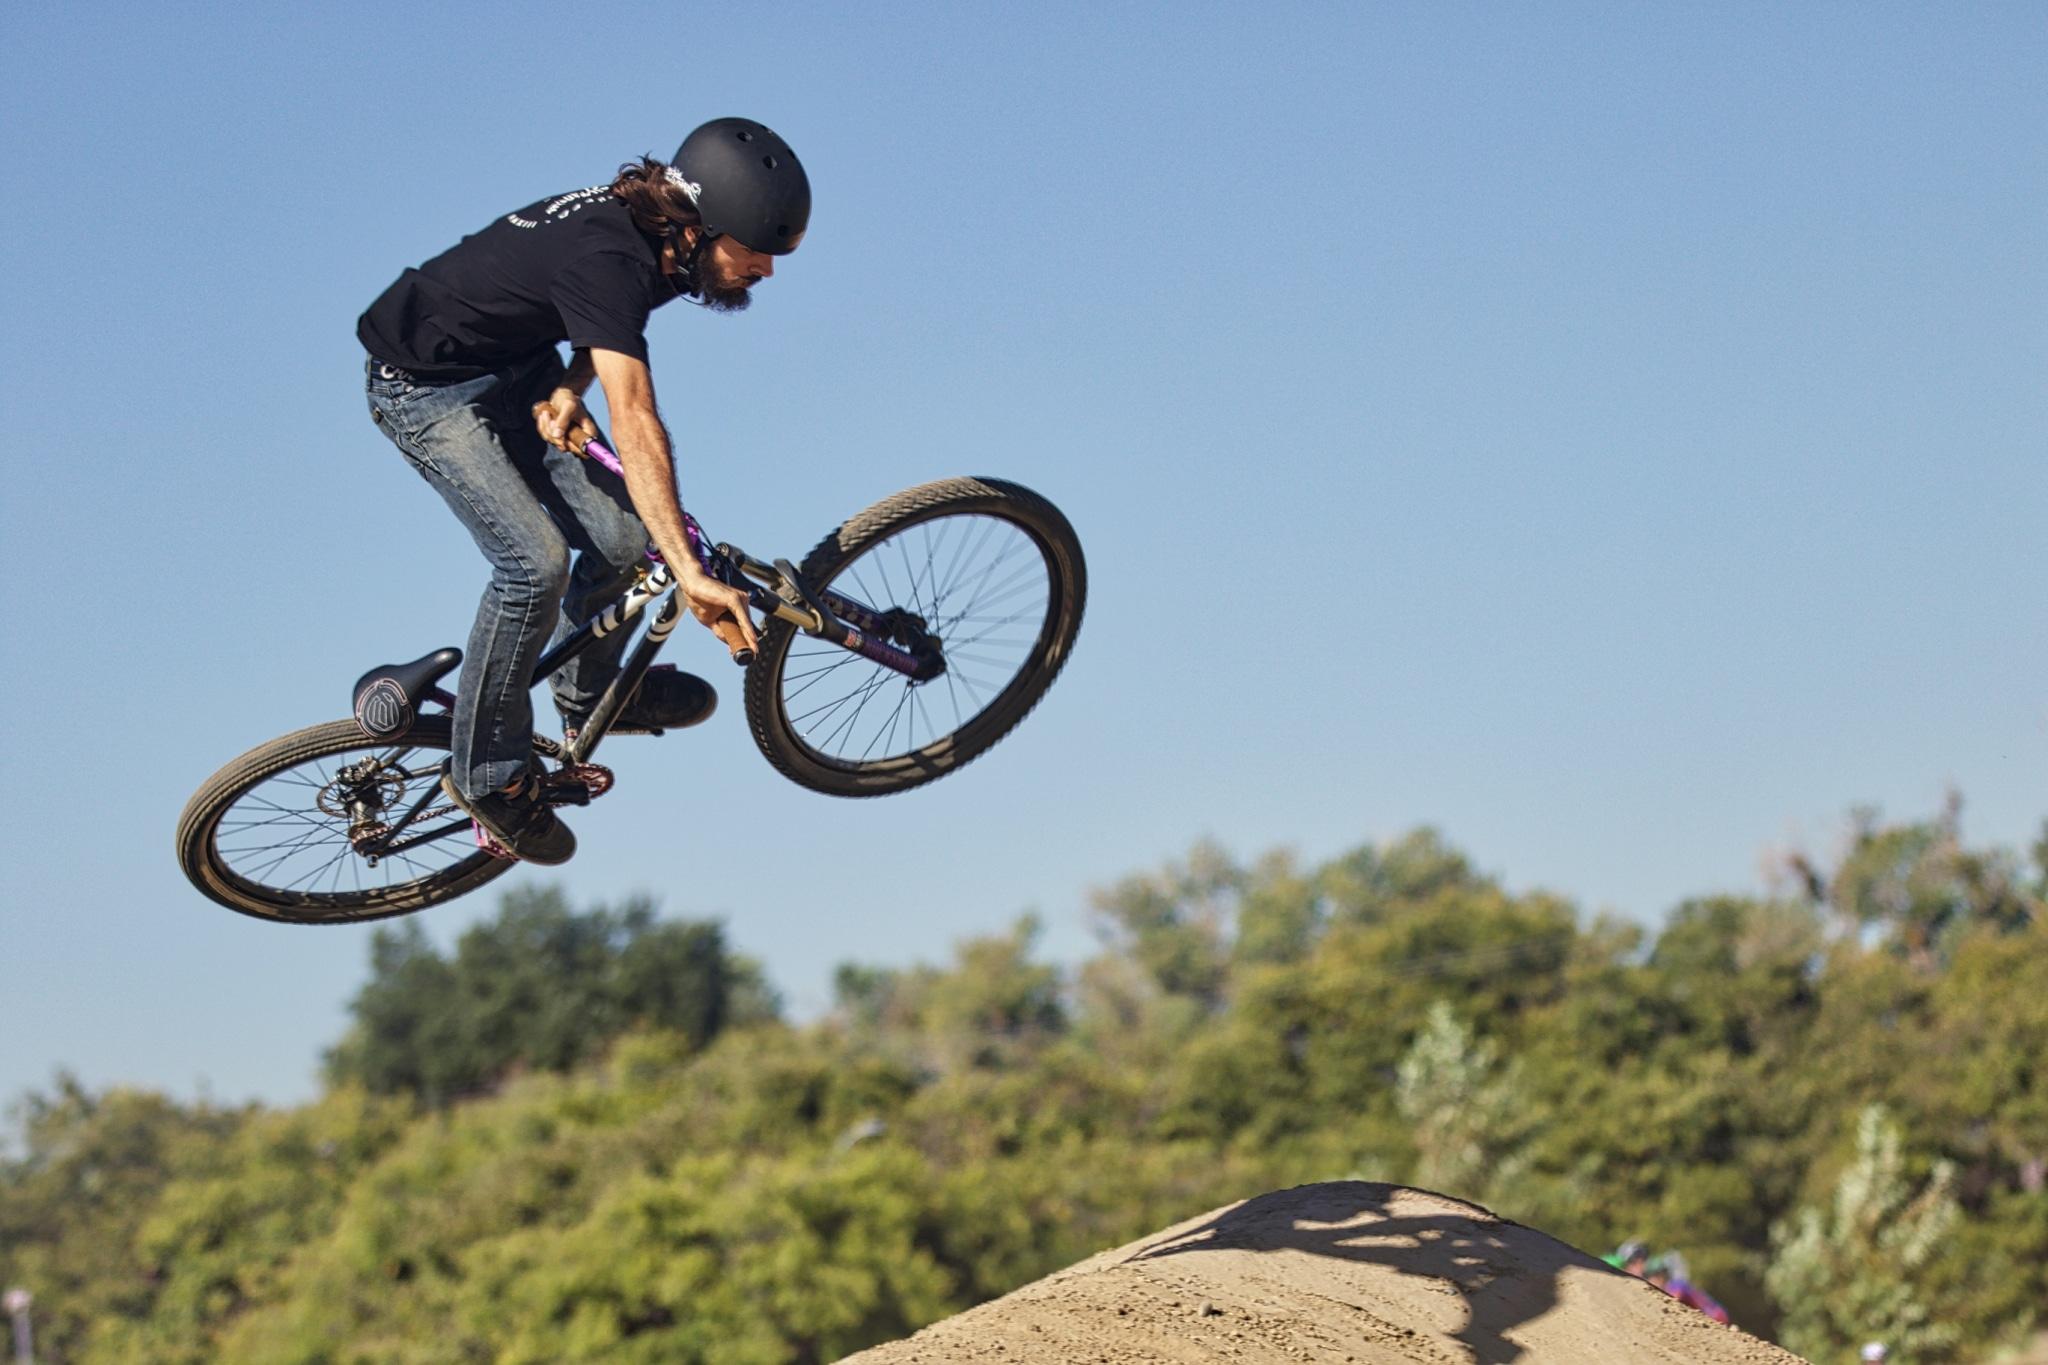 New Sacramento Bike Park Off to Flying Halloween Start via @sacramentopress